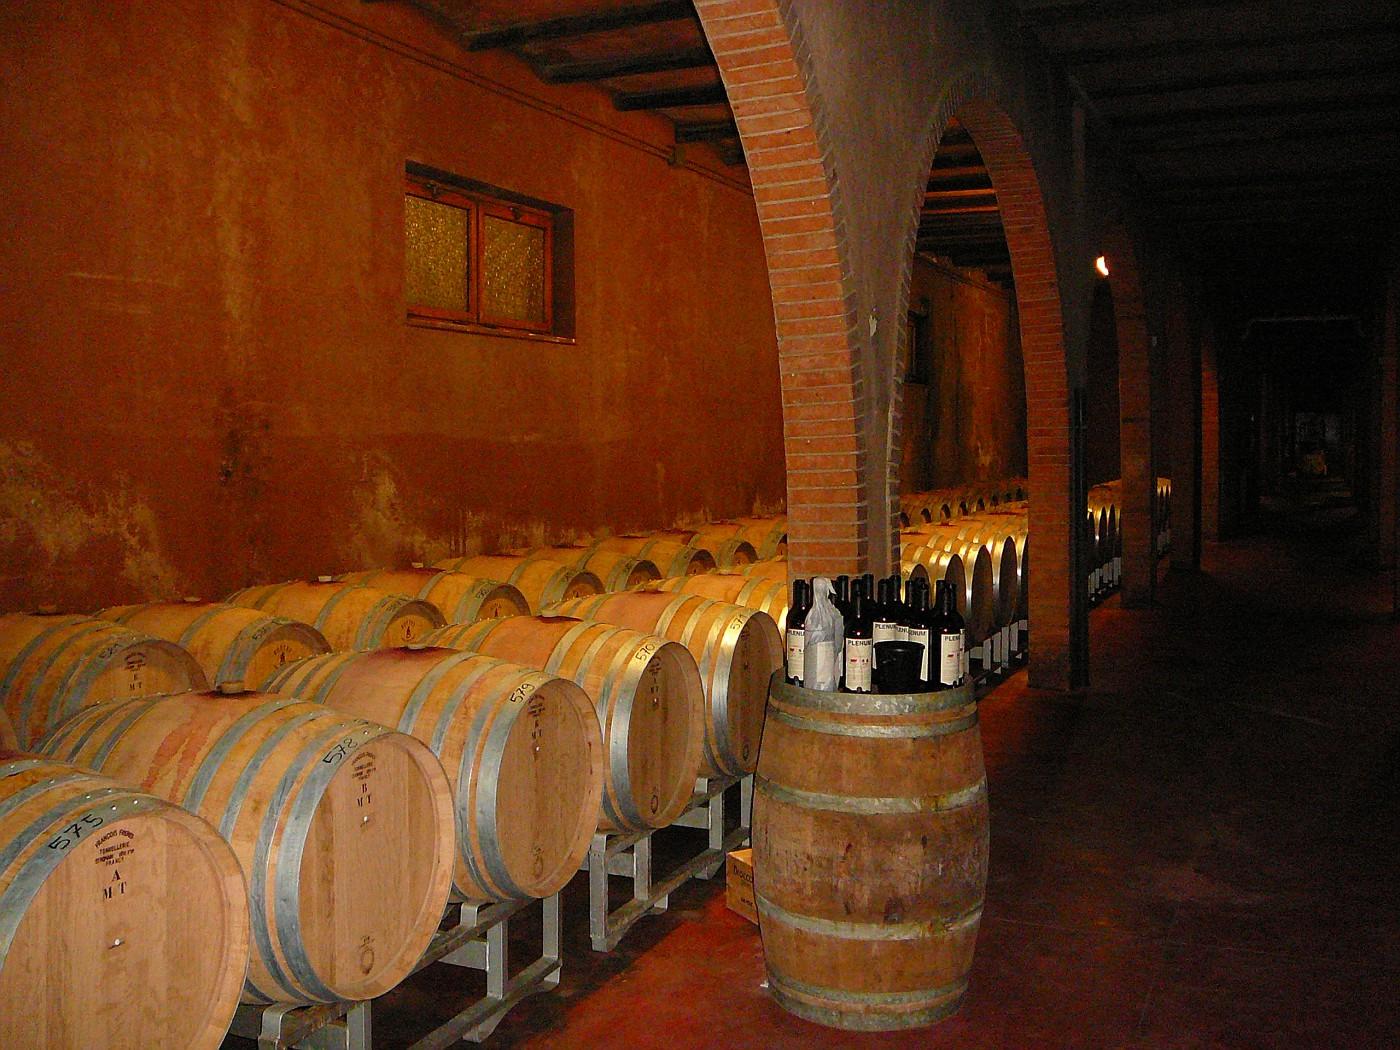 Dievole Winery New Cellar